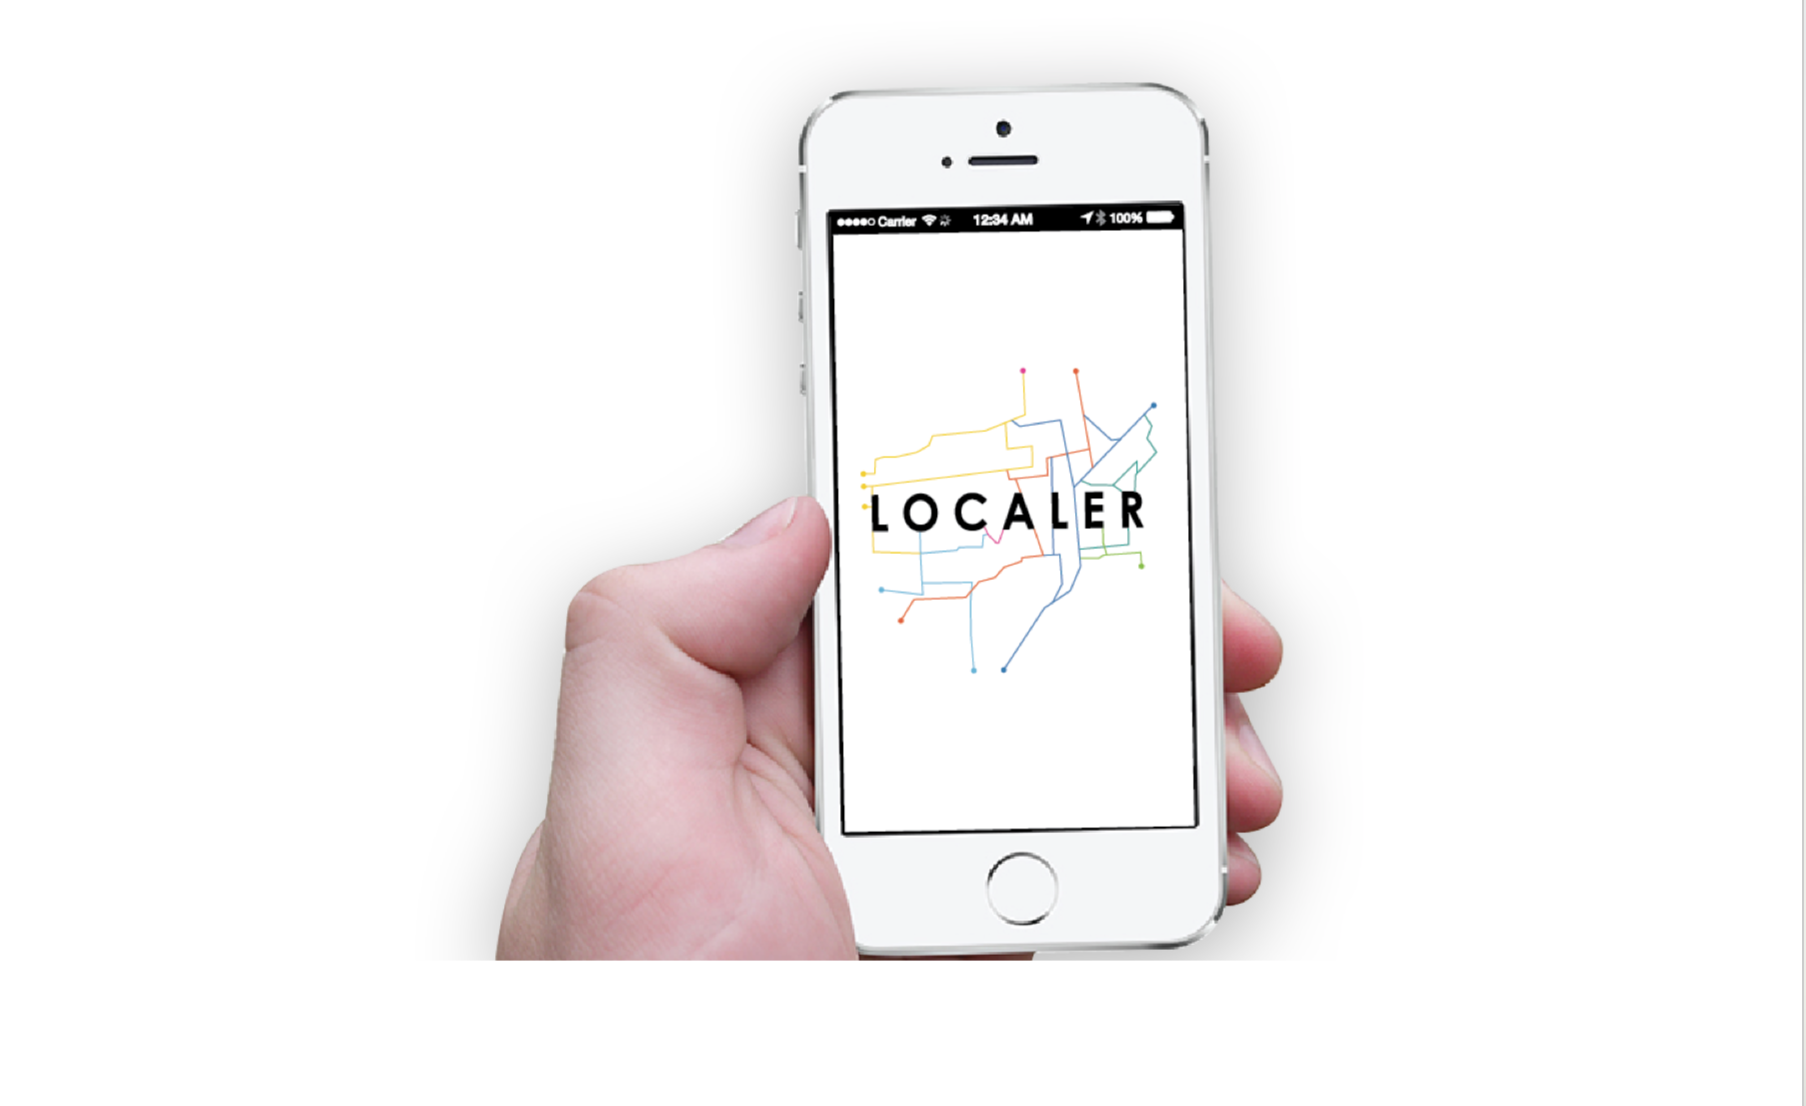 Localer Starup Planning